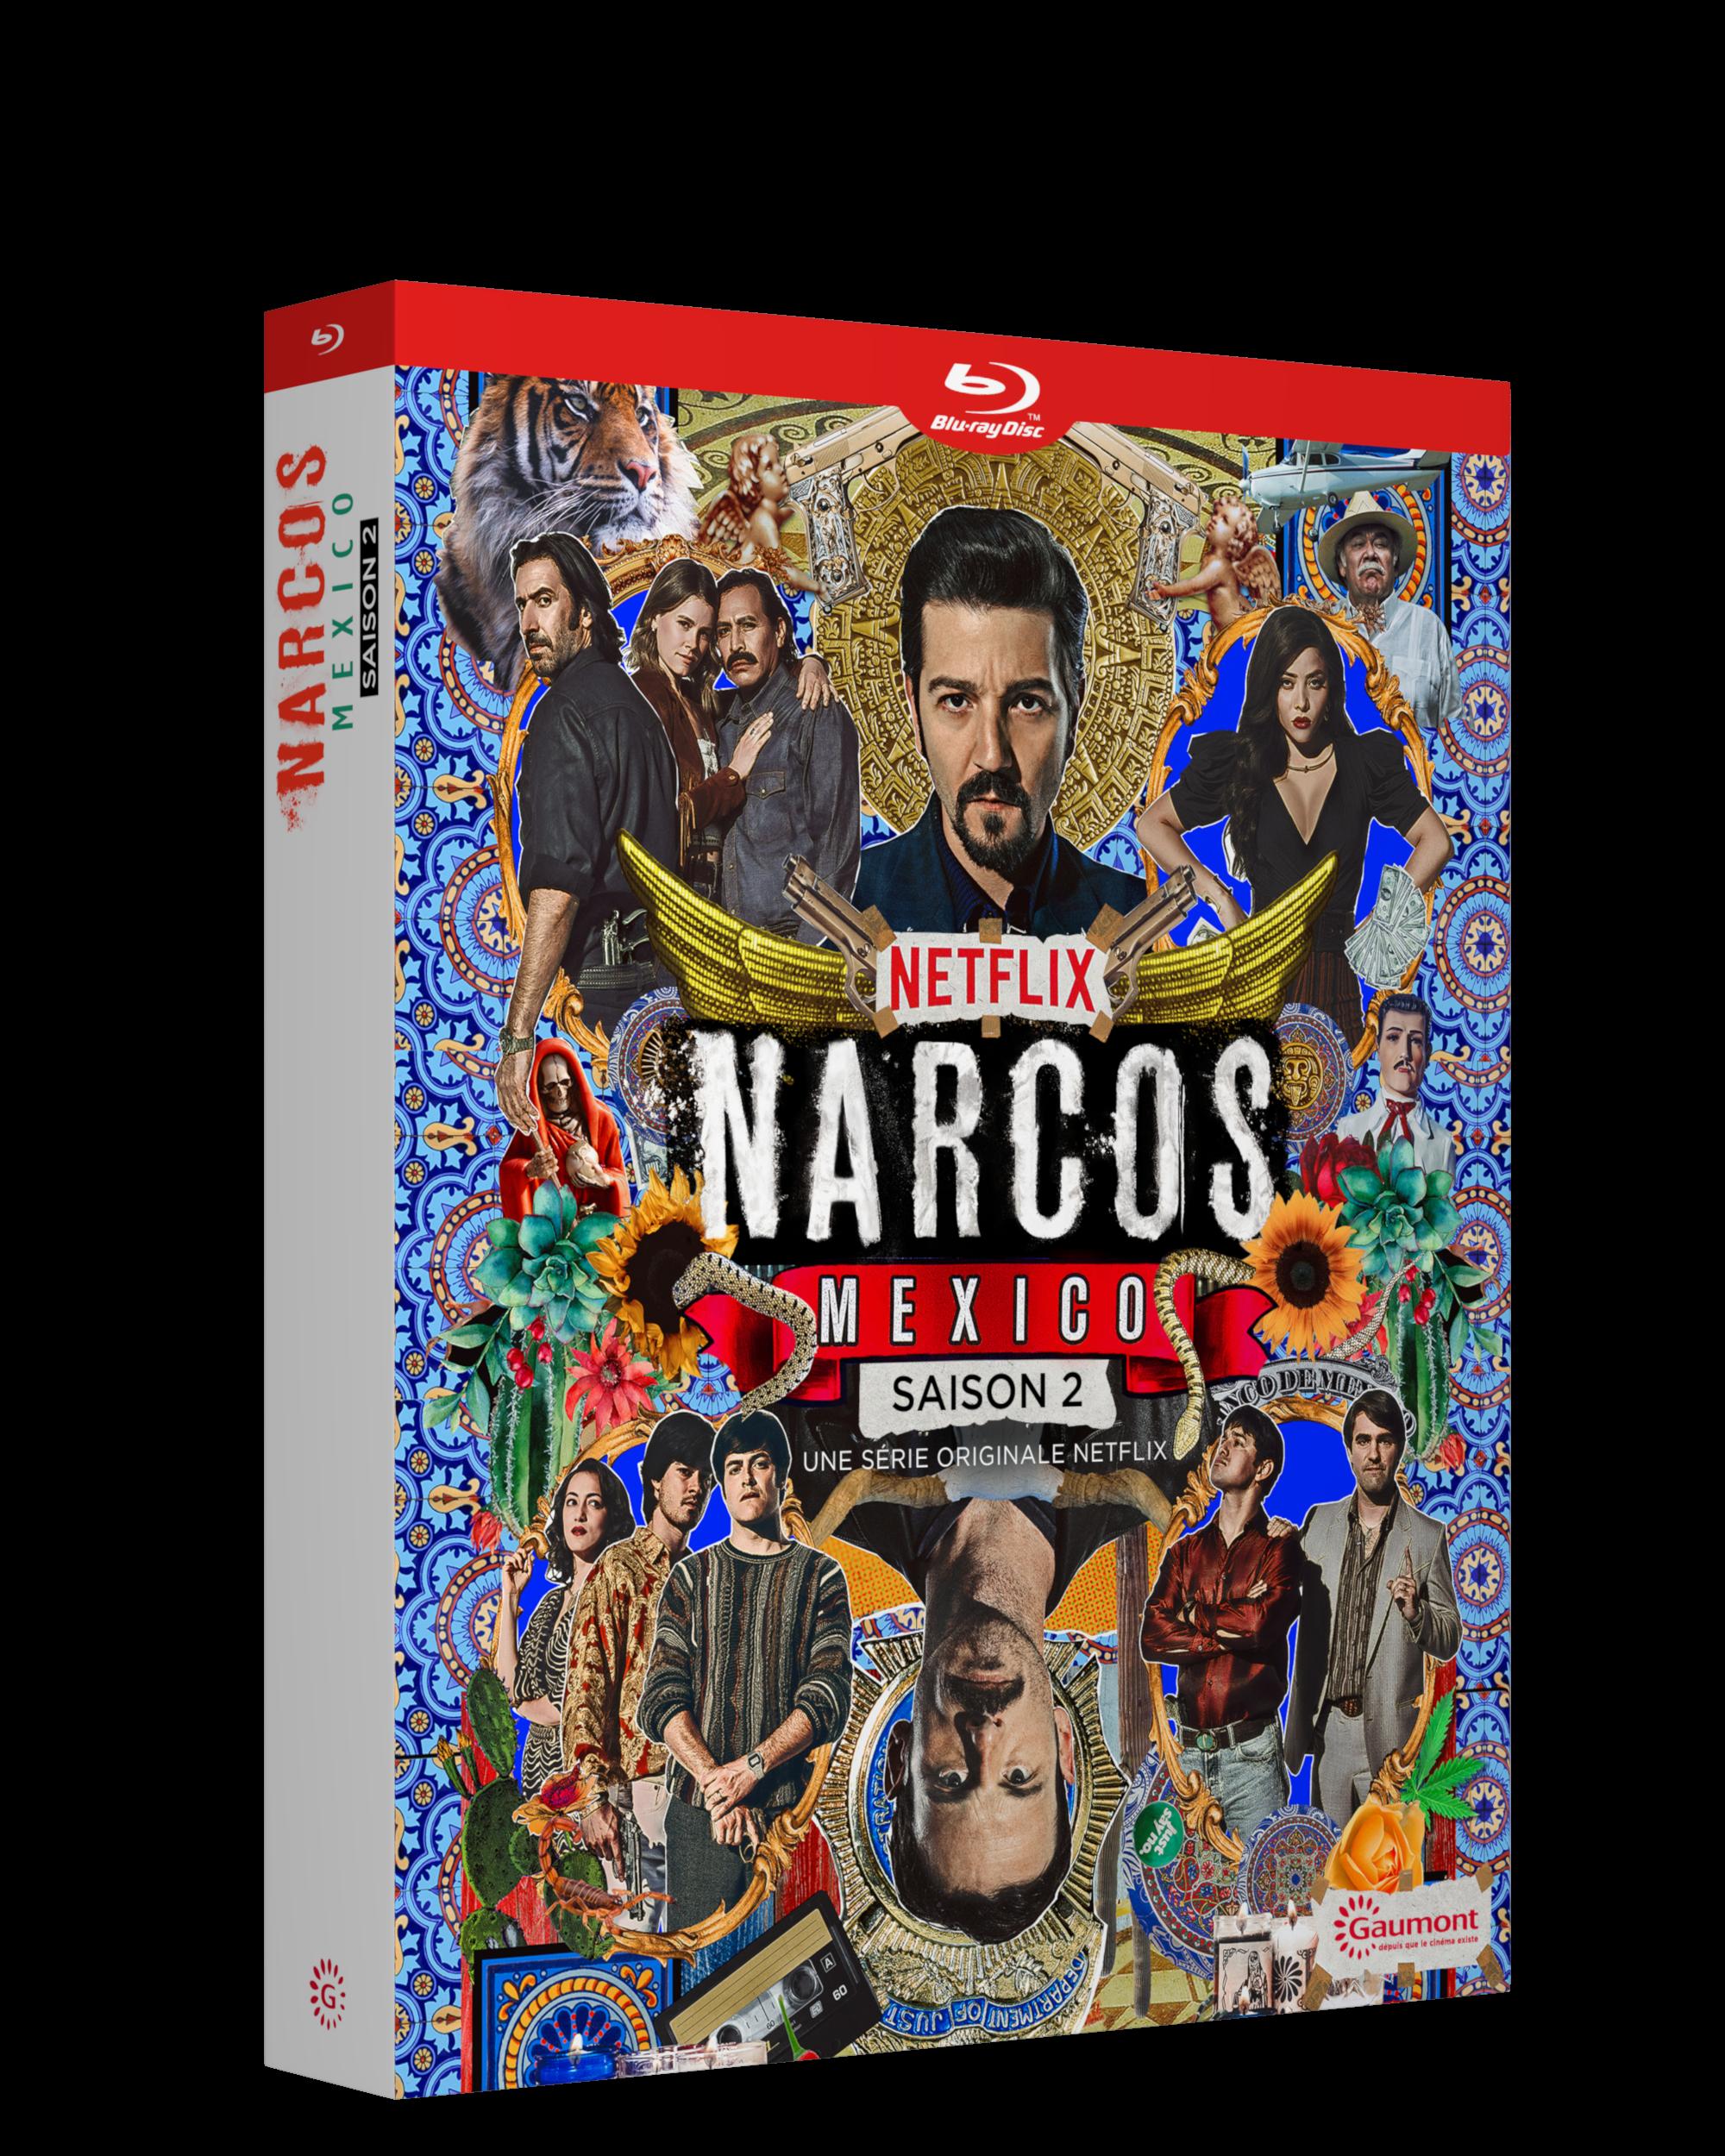 NARCOS MEXICO SAISON 2 - 4 BLU-RAY